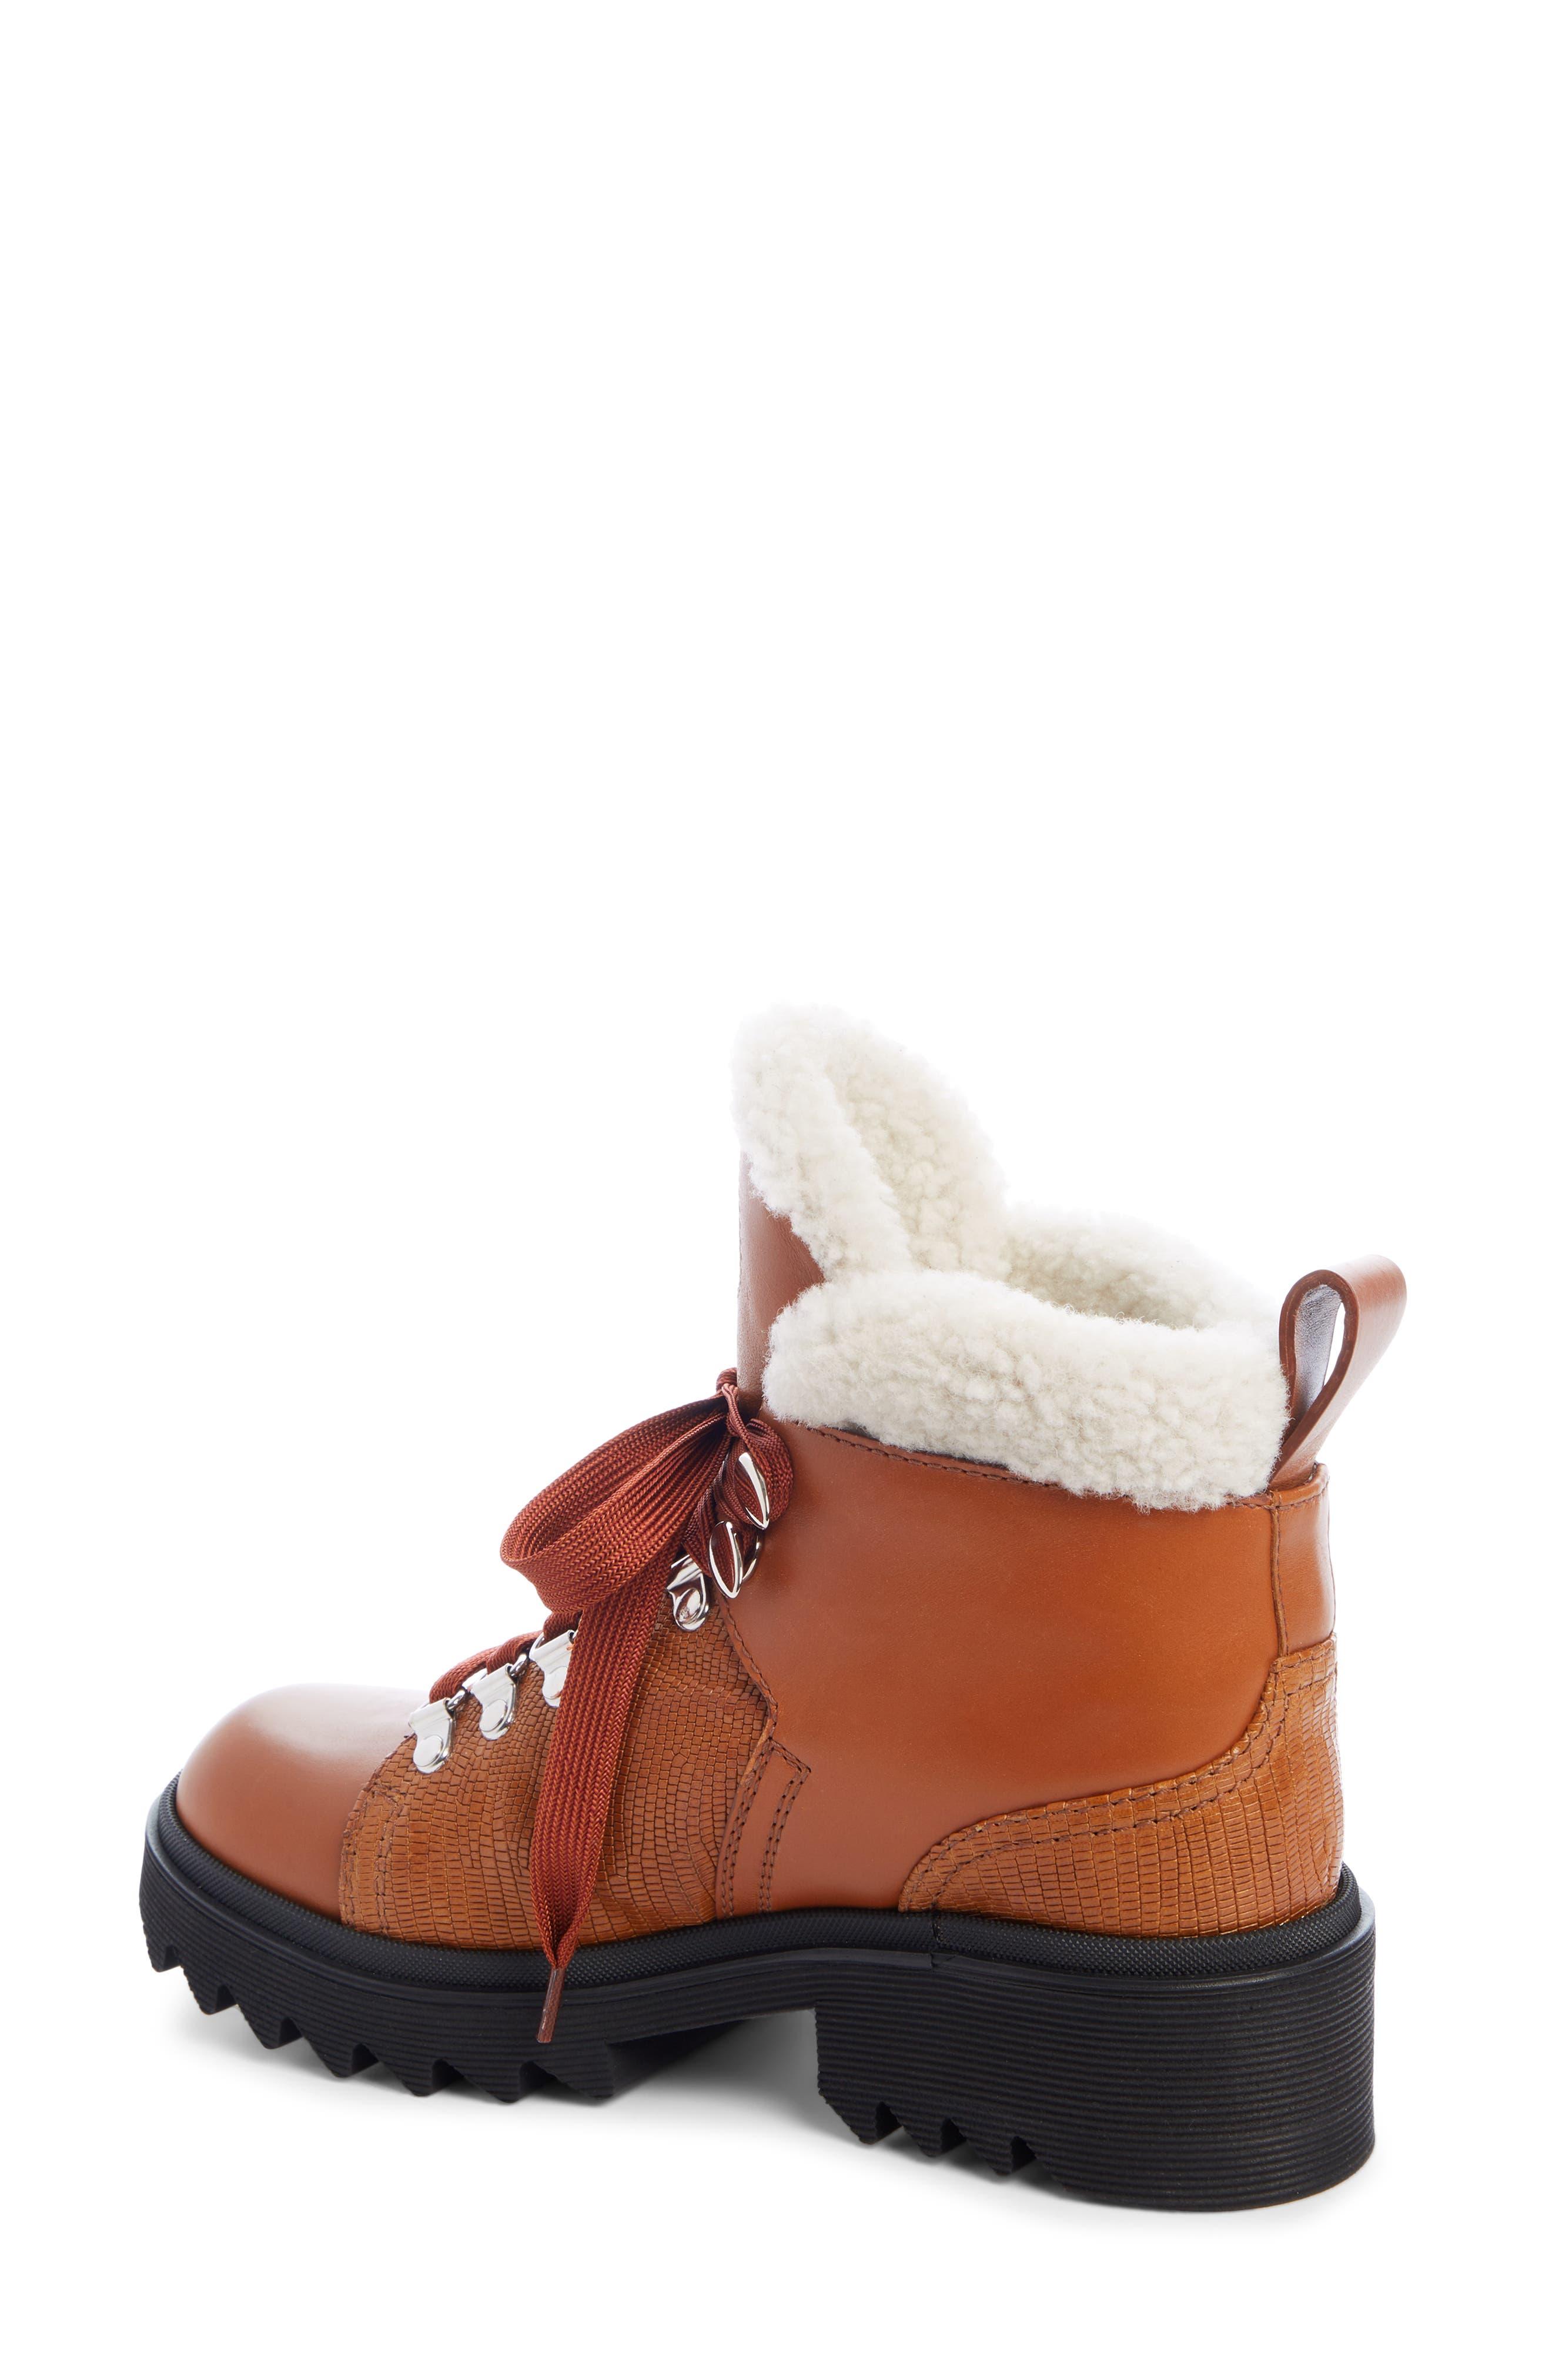 eae6a4b4102 Women's Chloé Boots   Nordstrom